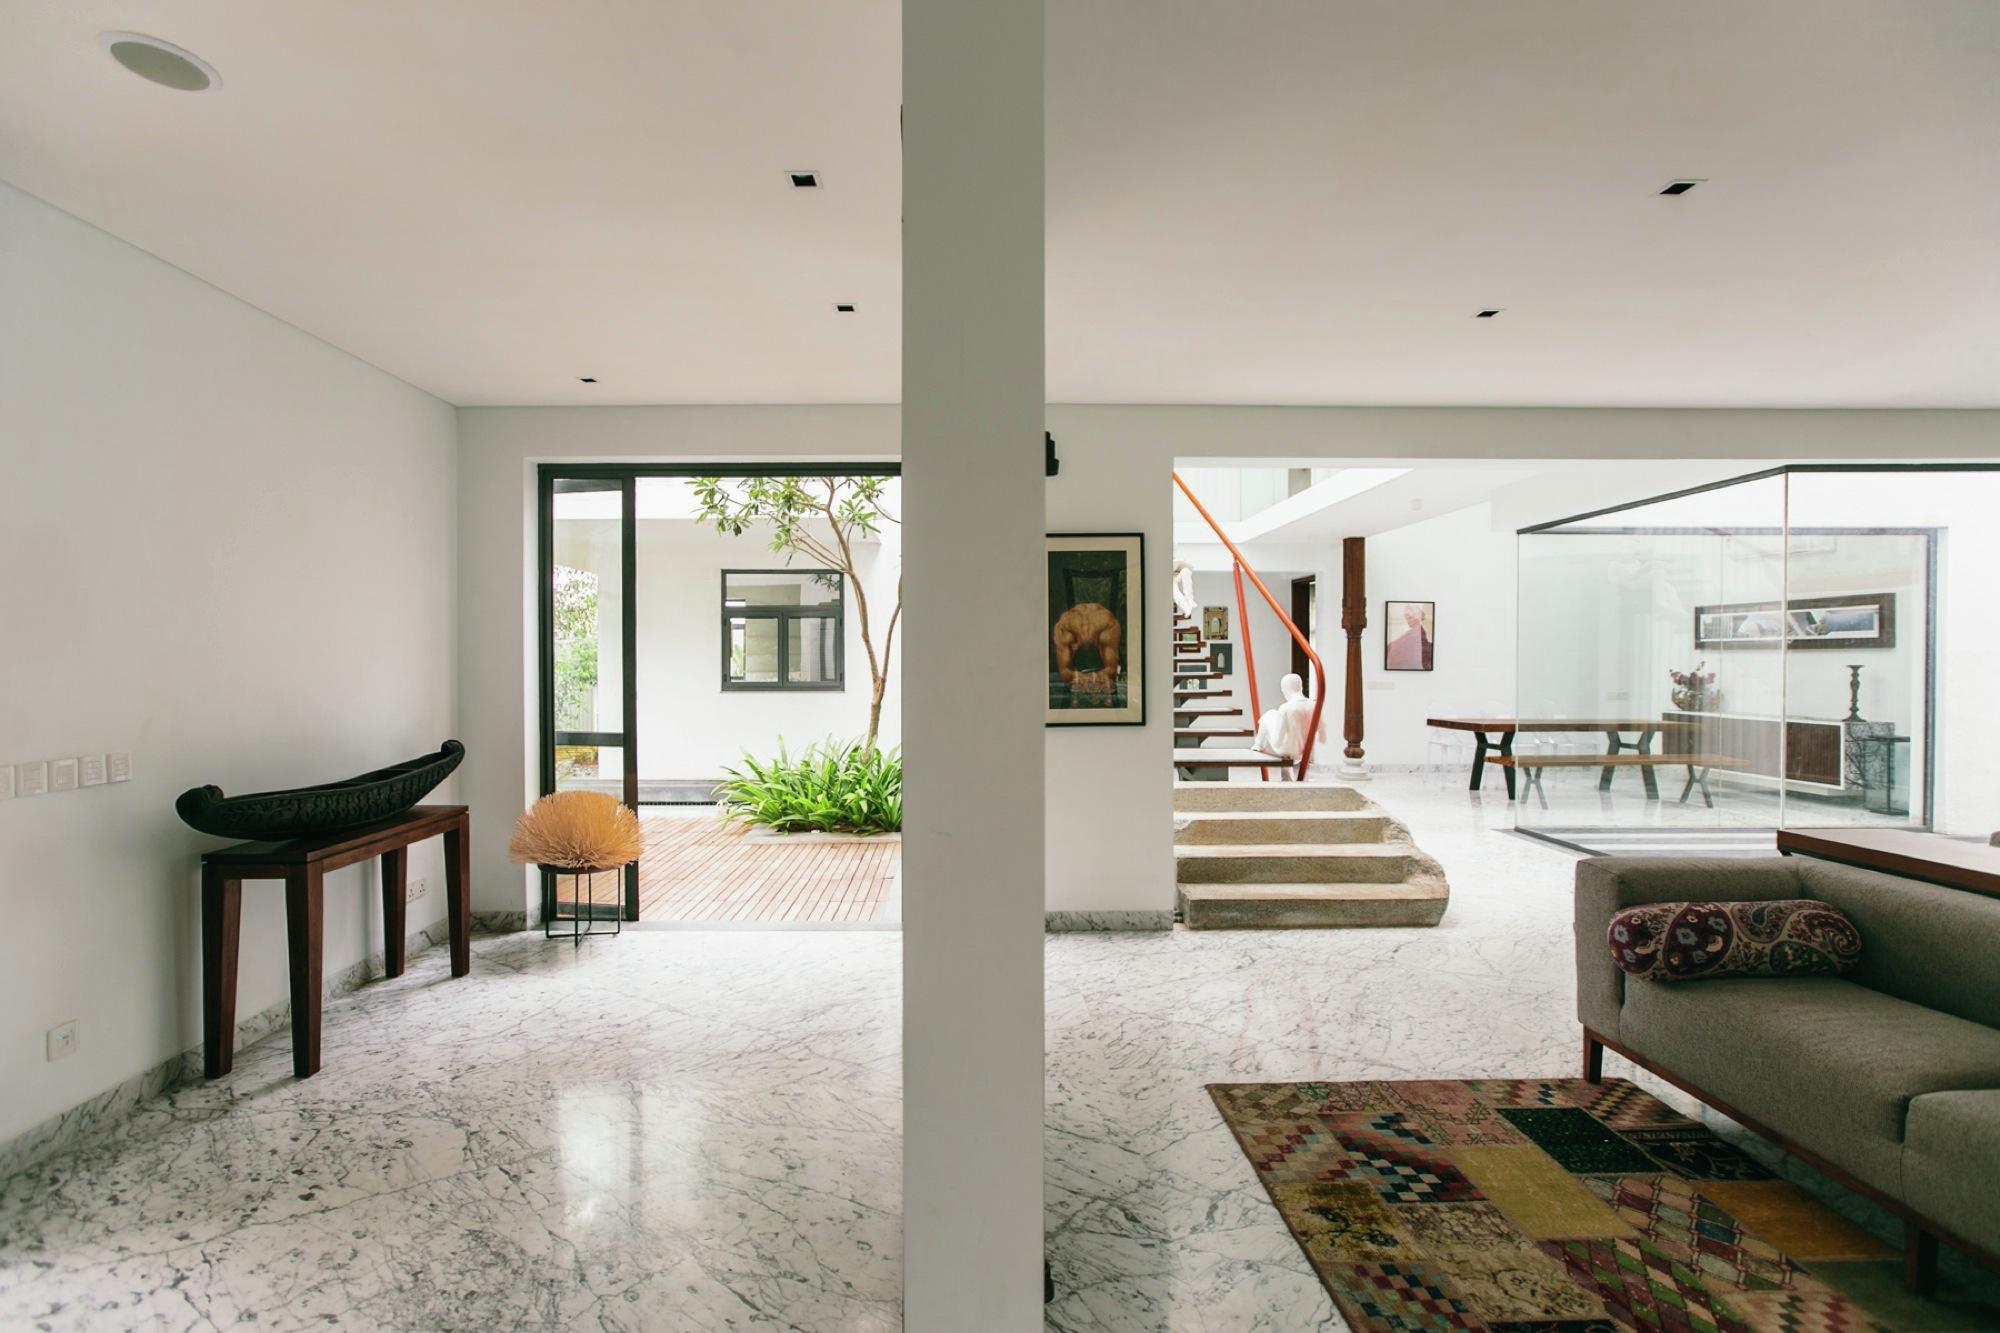 Galeria de Casa Pátio / Abin Design Studio - 19